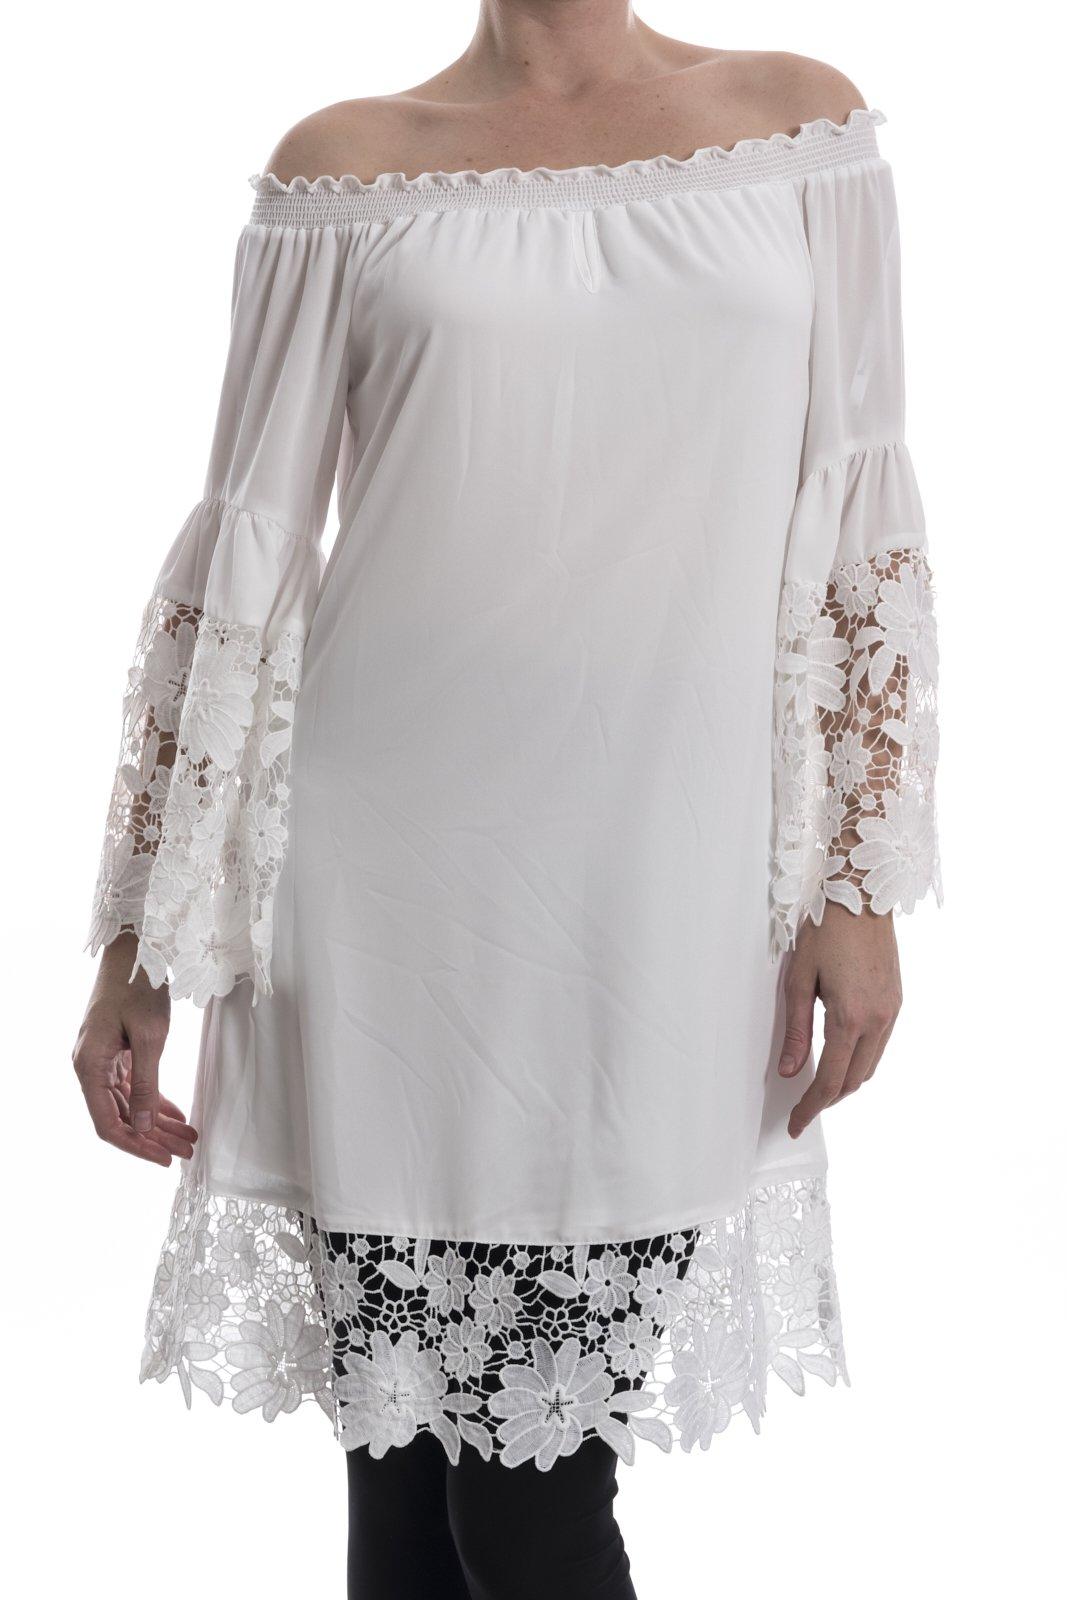 Joseph Ribkoff Lace Trim Off White Dress Style 181242 - Medium